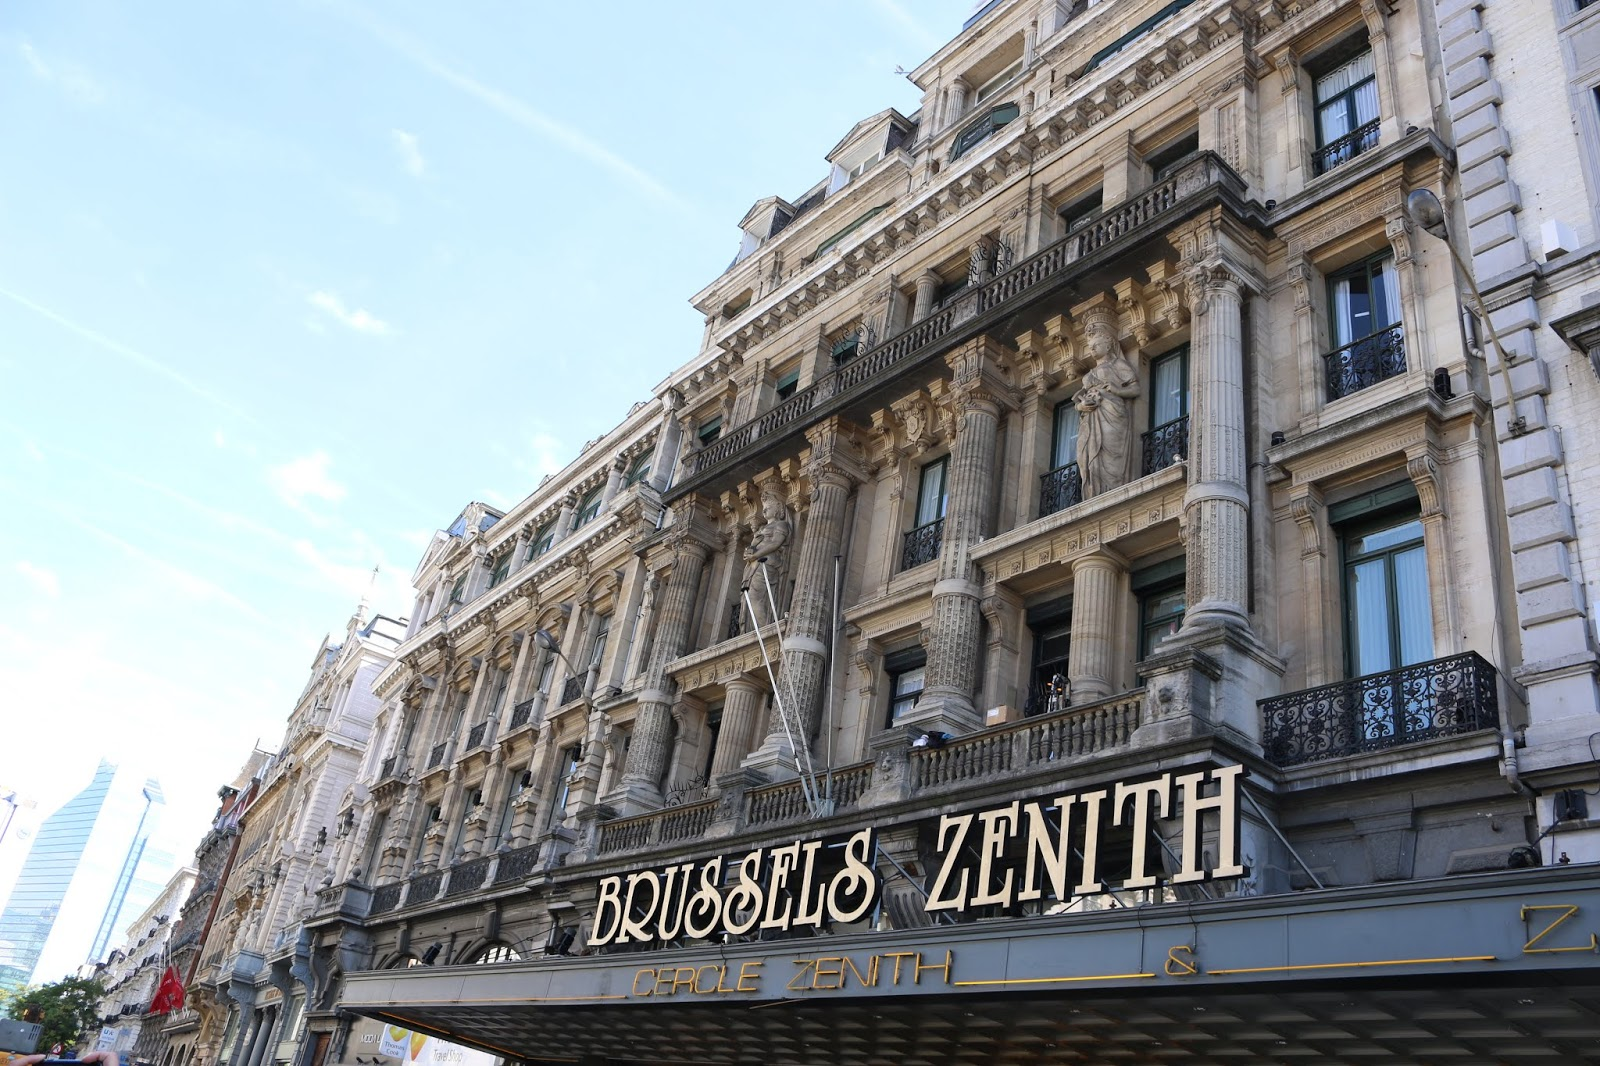 Brussels Zenith Casino